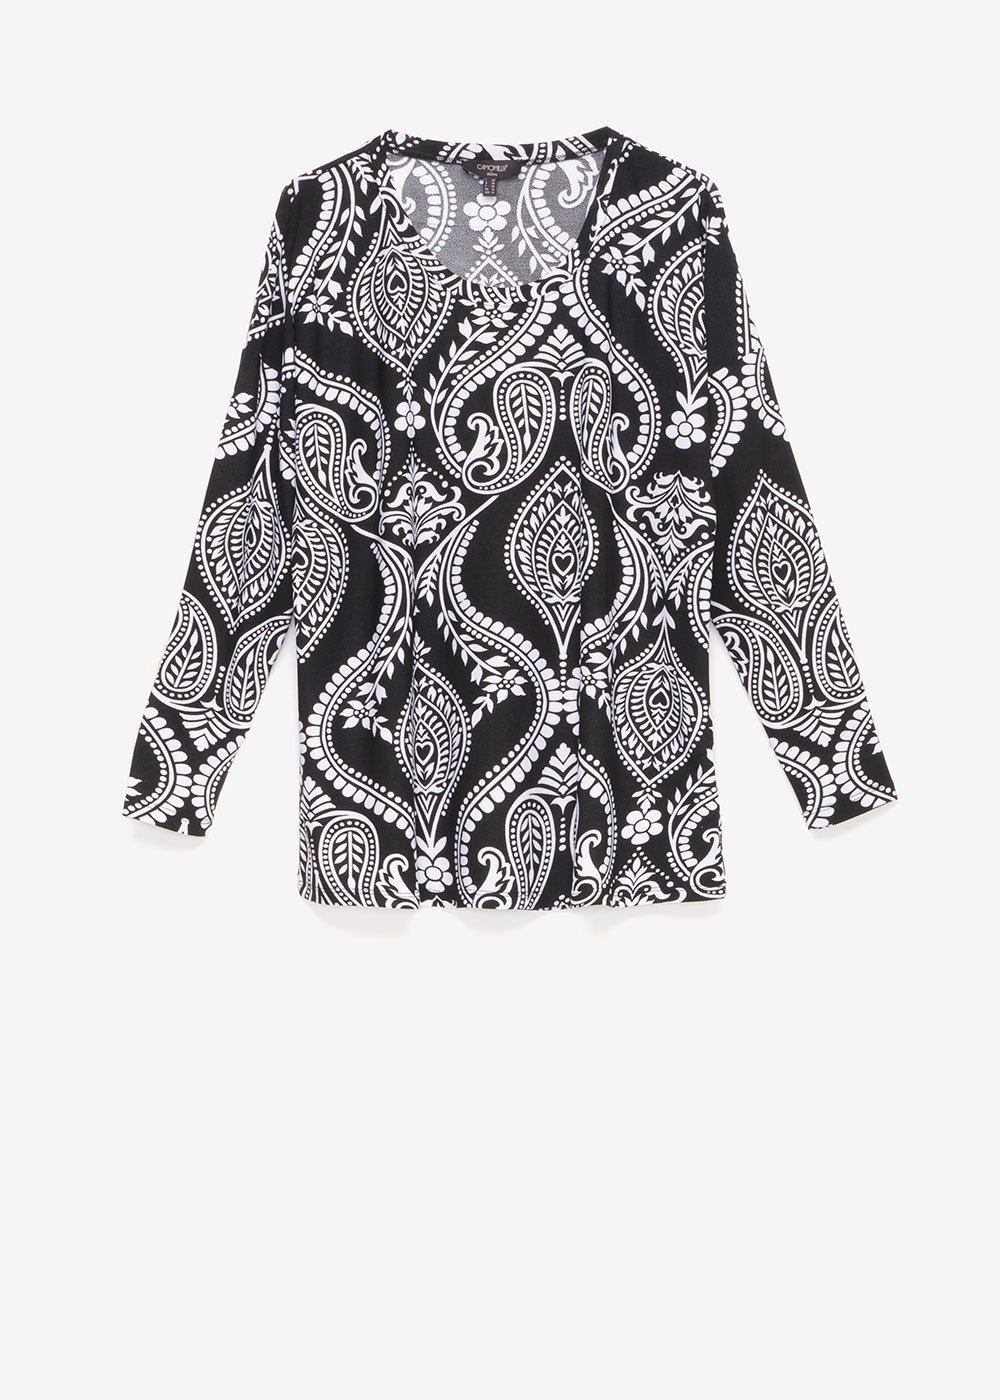 Shana T-shirt with paisley pattern - Black / White / Multi - Woman